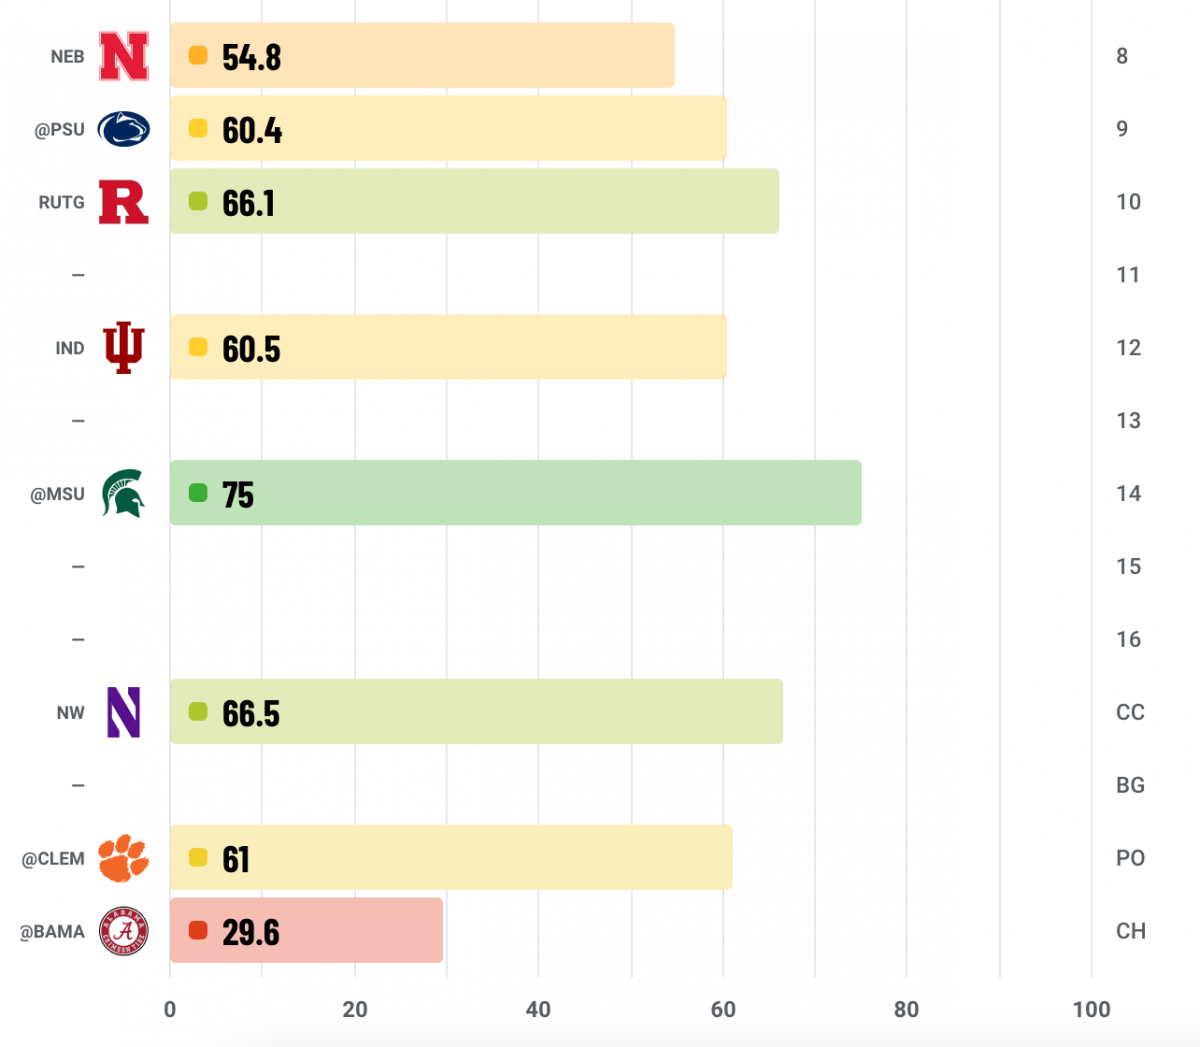 Sevyn Banks' 2020 game grades by PFF